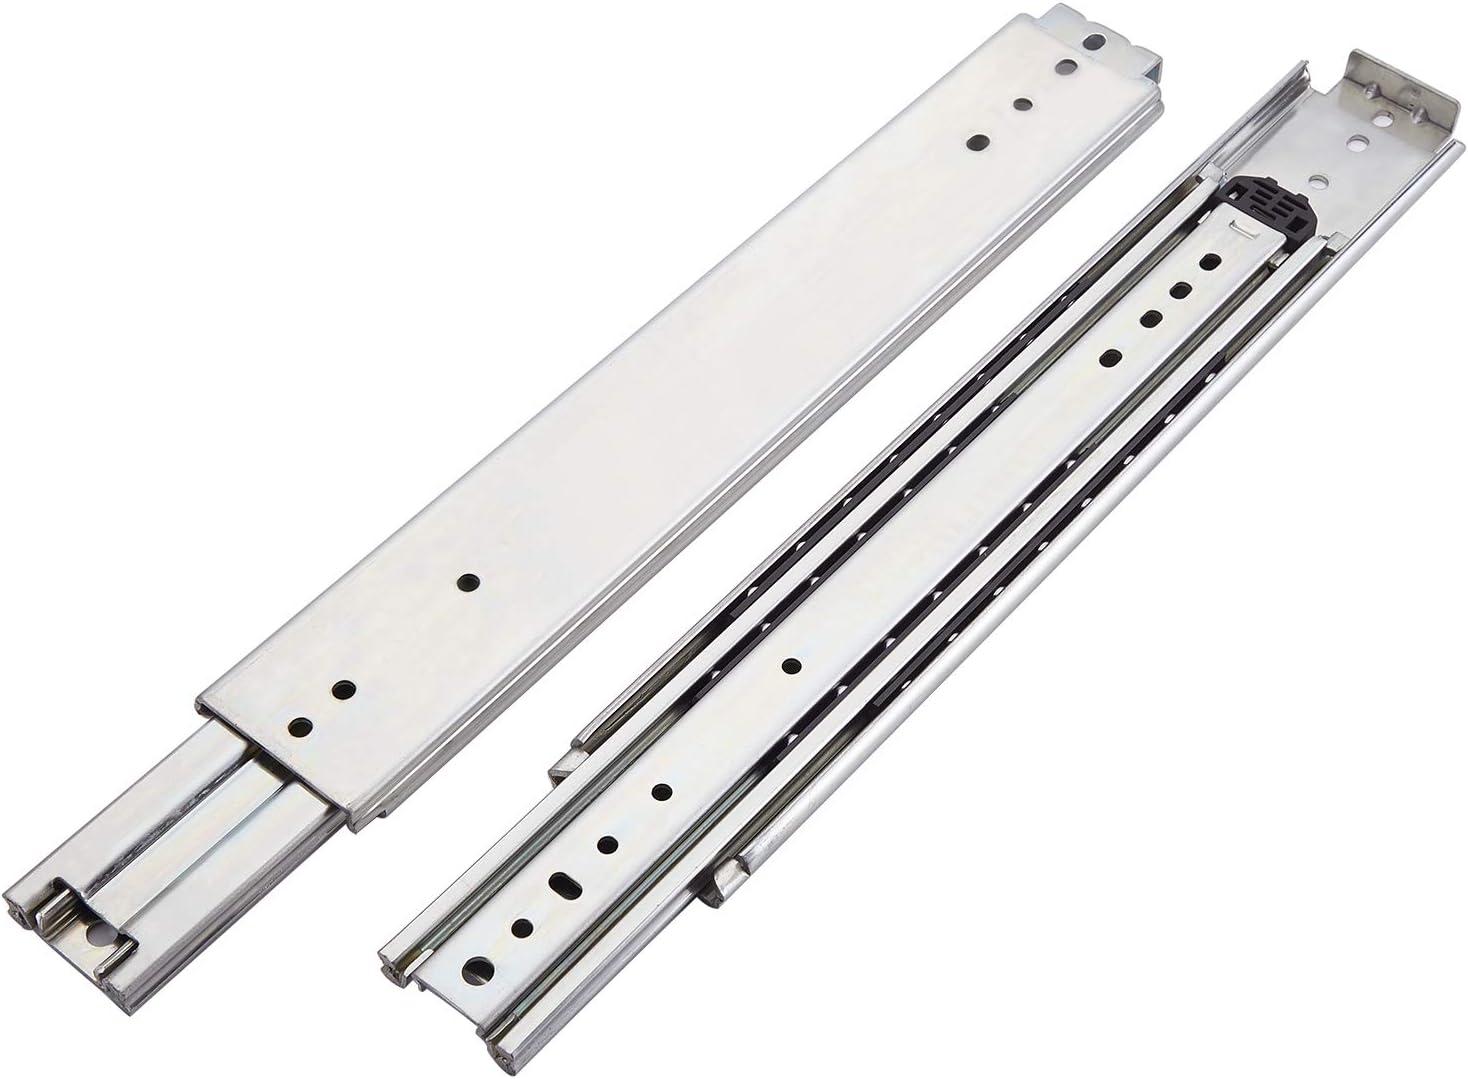 VAPSINT 1 Pair 28 Inch 500LB Capacity Full Extension Ball Bearing Heavy Duty Drawer Slides,3 Fold Slide Mount Drawer Slides Cabinet Rails,Available in 18'',20'',28'',32'',36'' Lengths